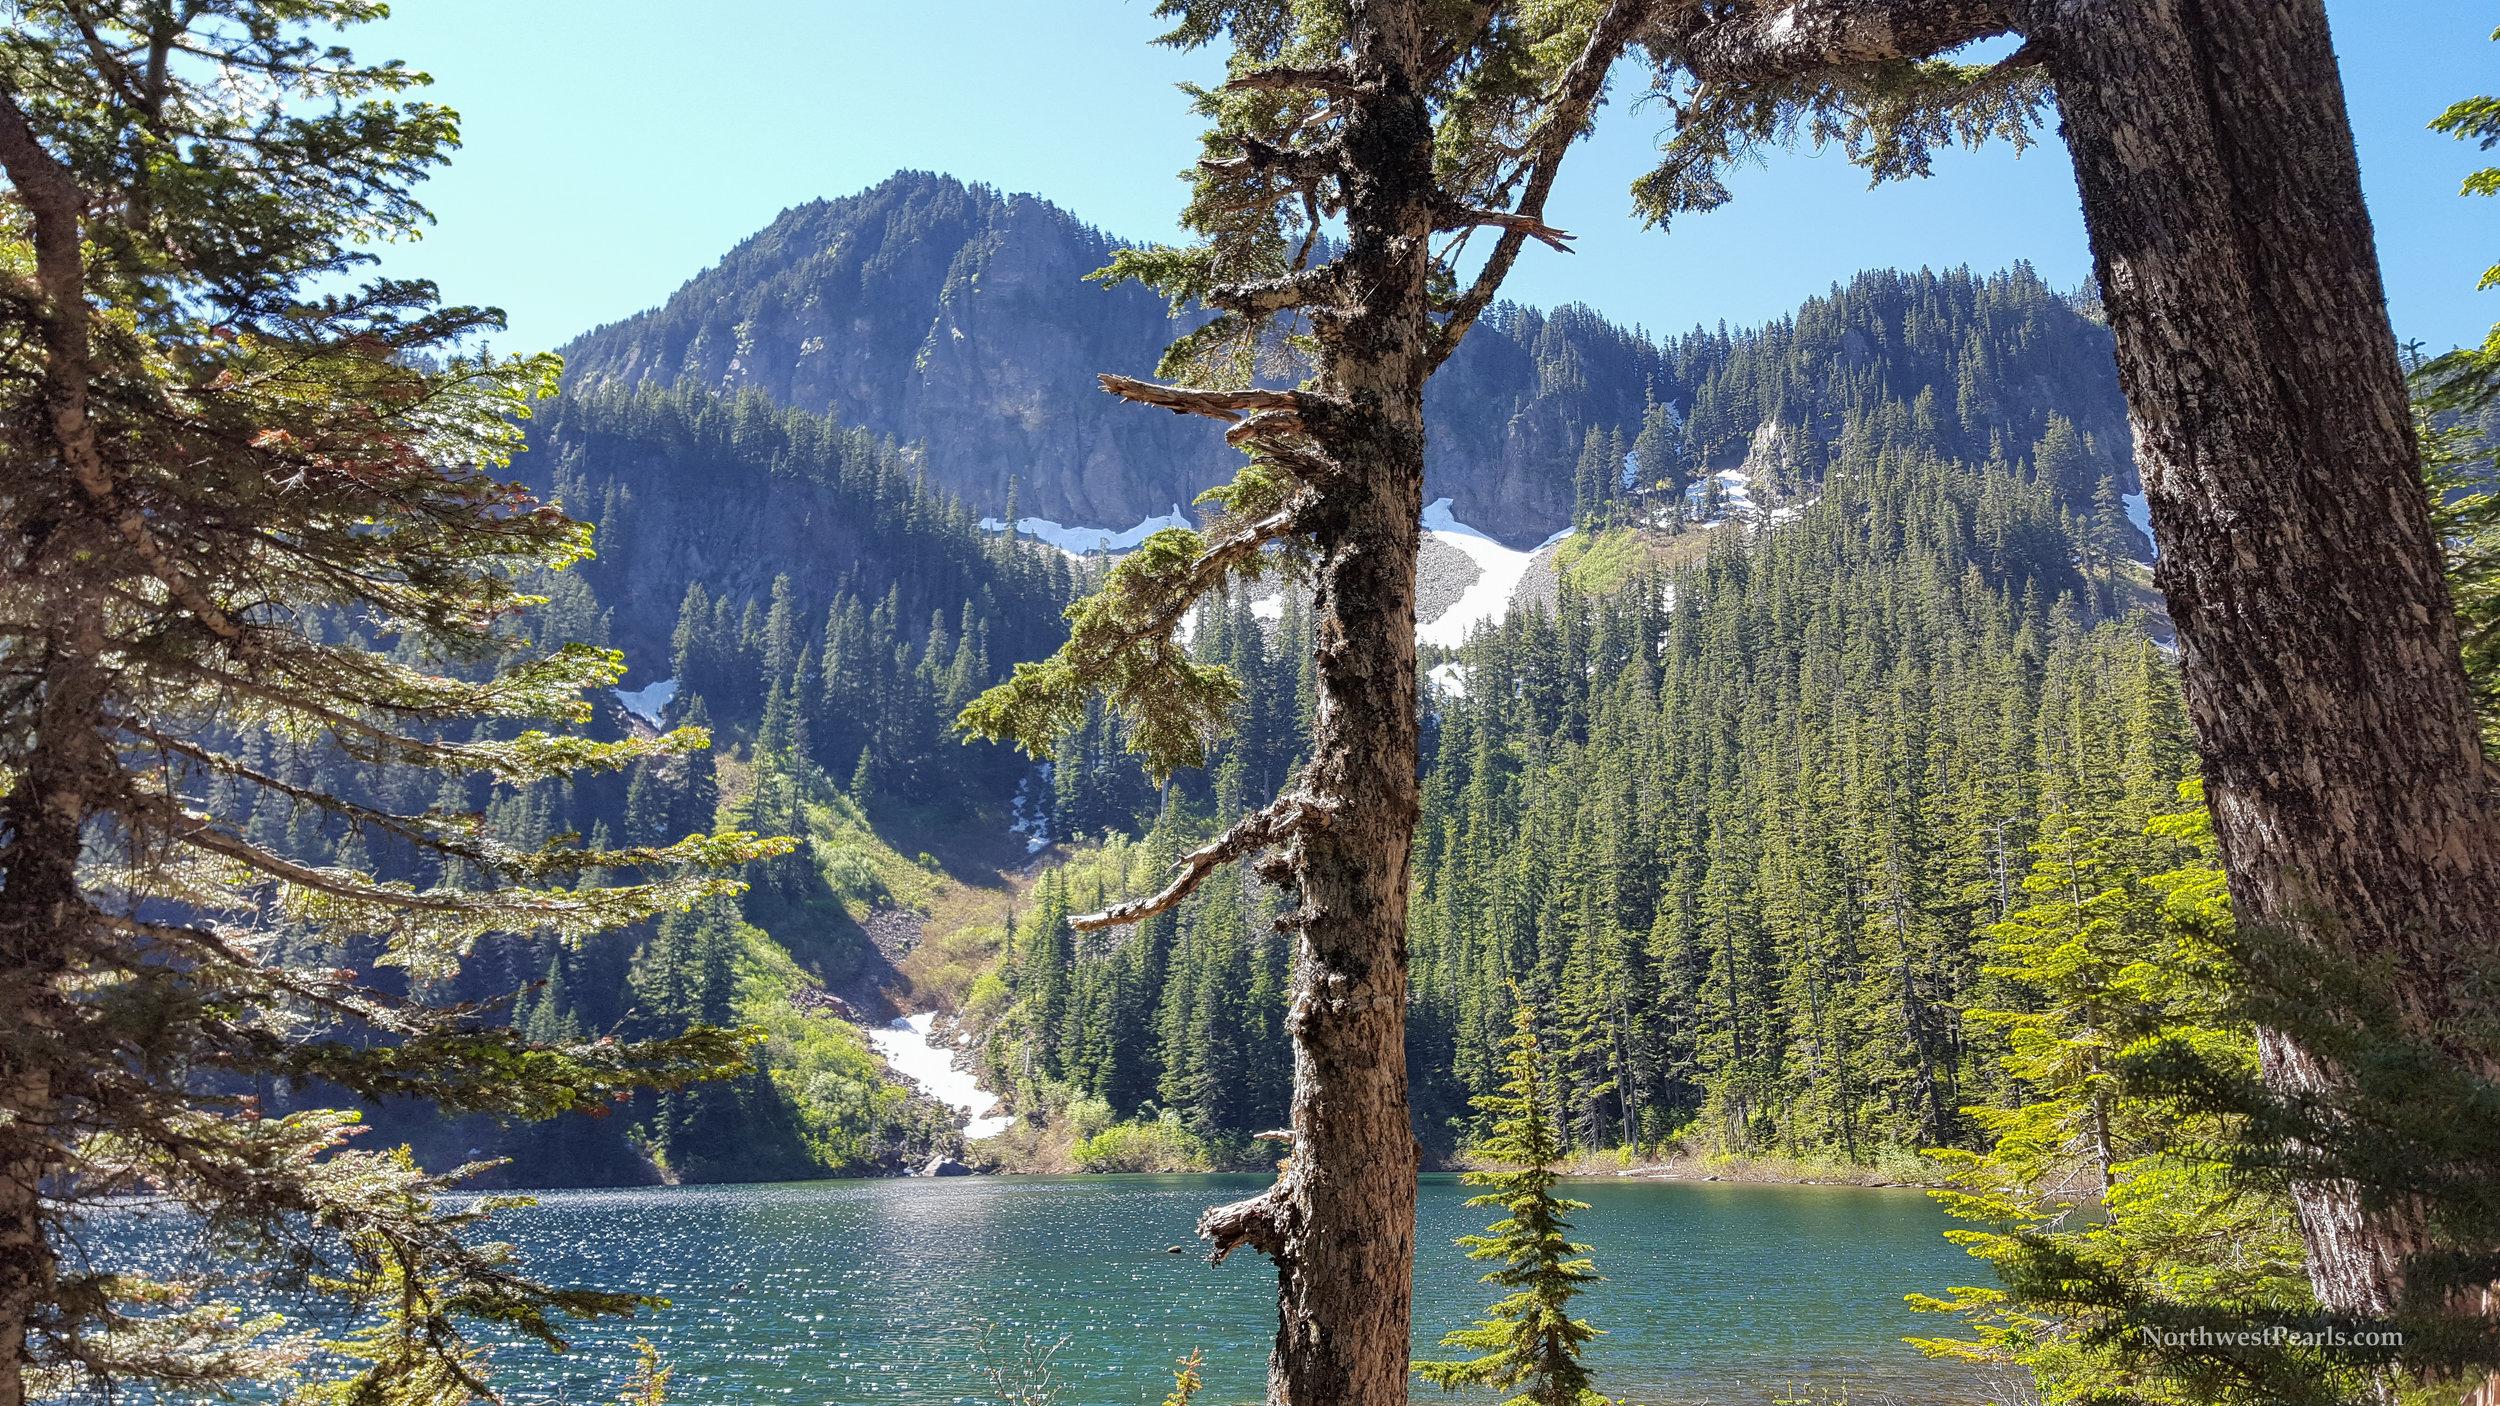 Northwest Pearls: Annette Lake